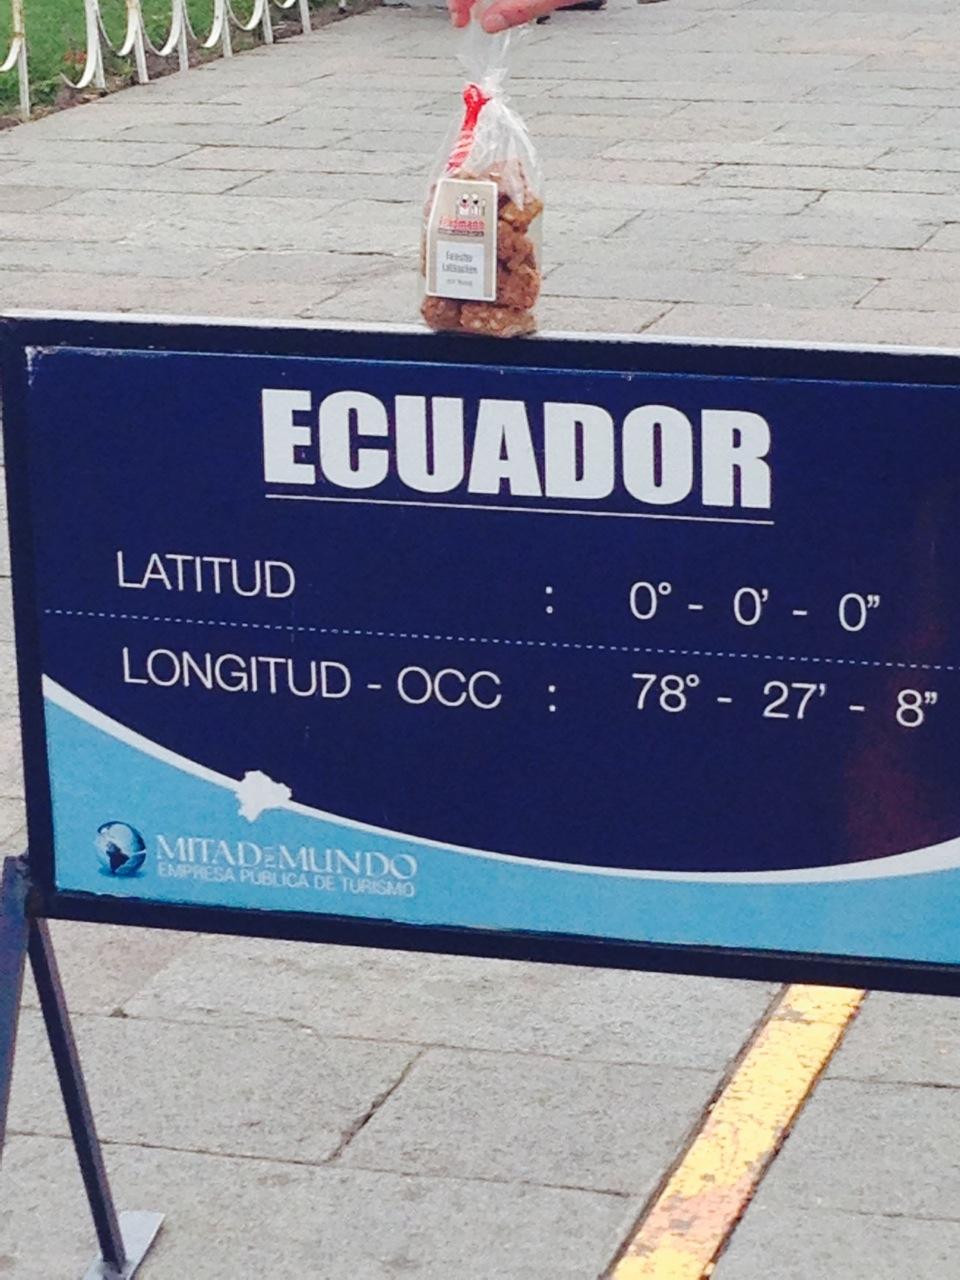 Südamerika Pichincha, Ecuador 2014